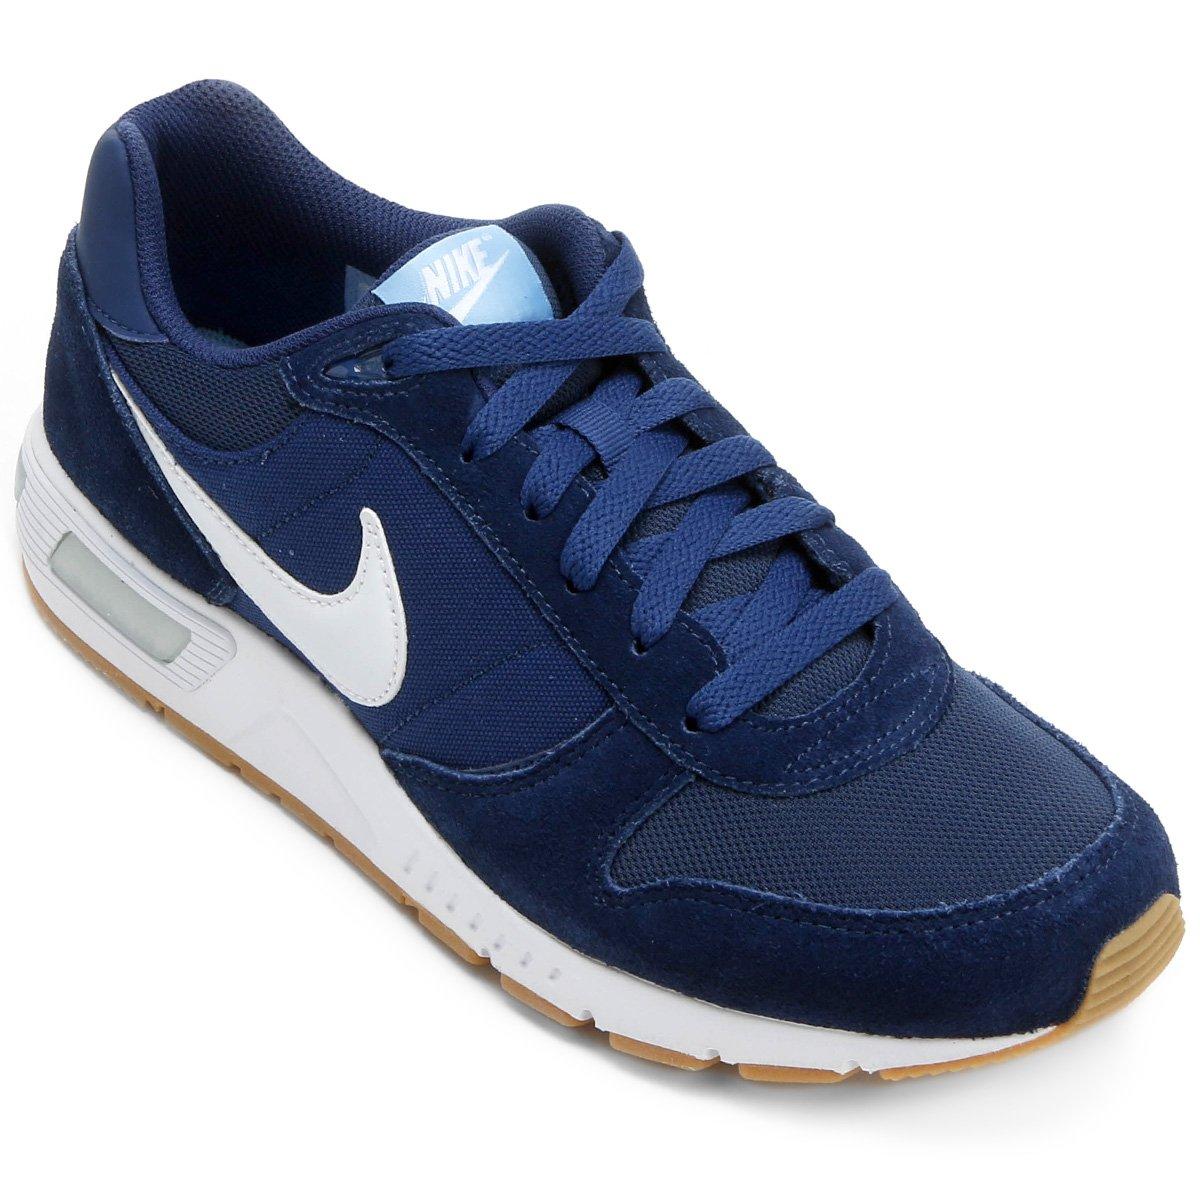 1bb34d4c2d4 Tênis Nike Nightgazer Masculino - Azul e Branco - Compre Agora ...